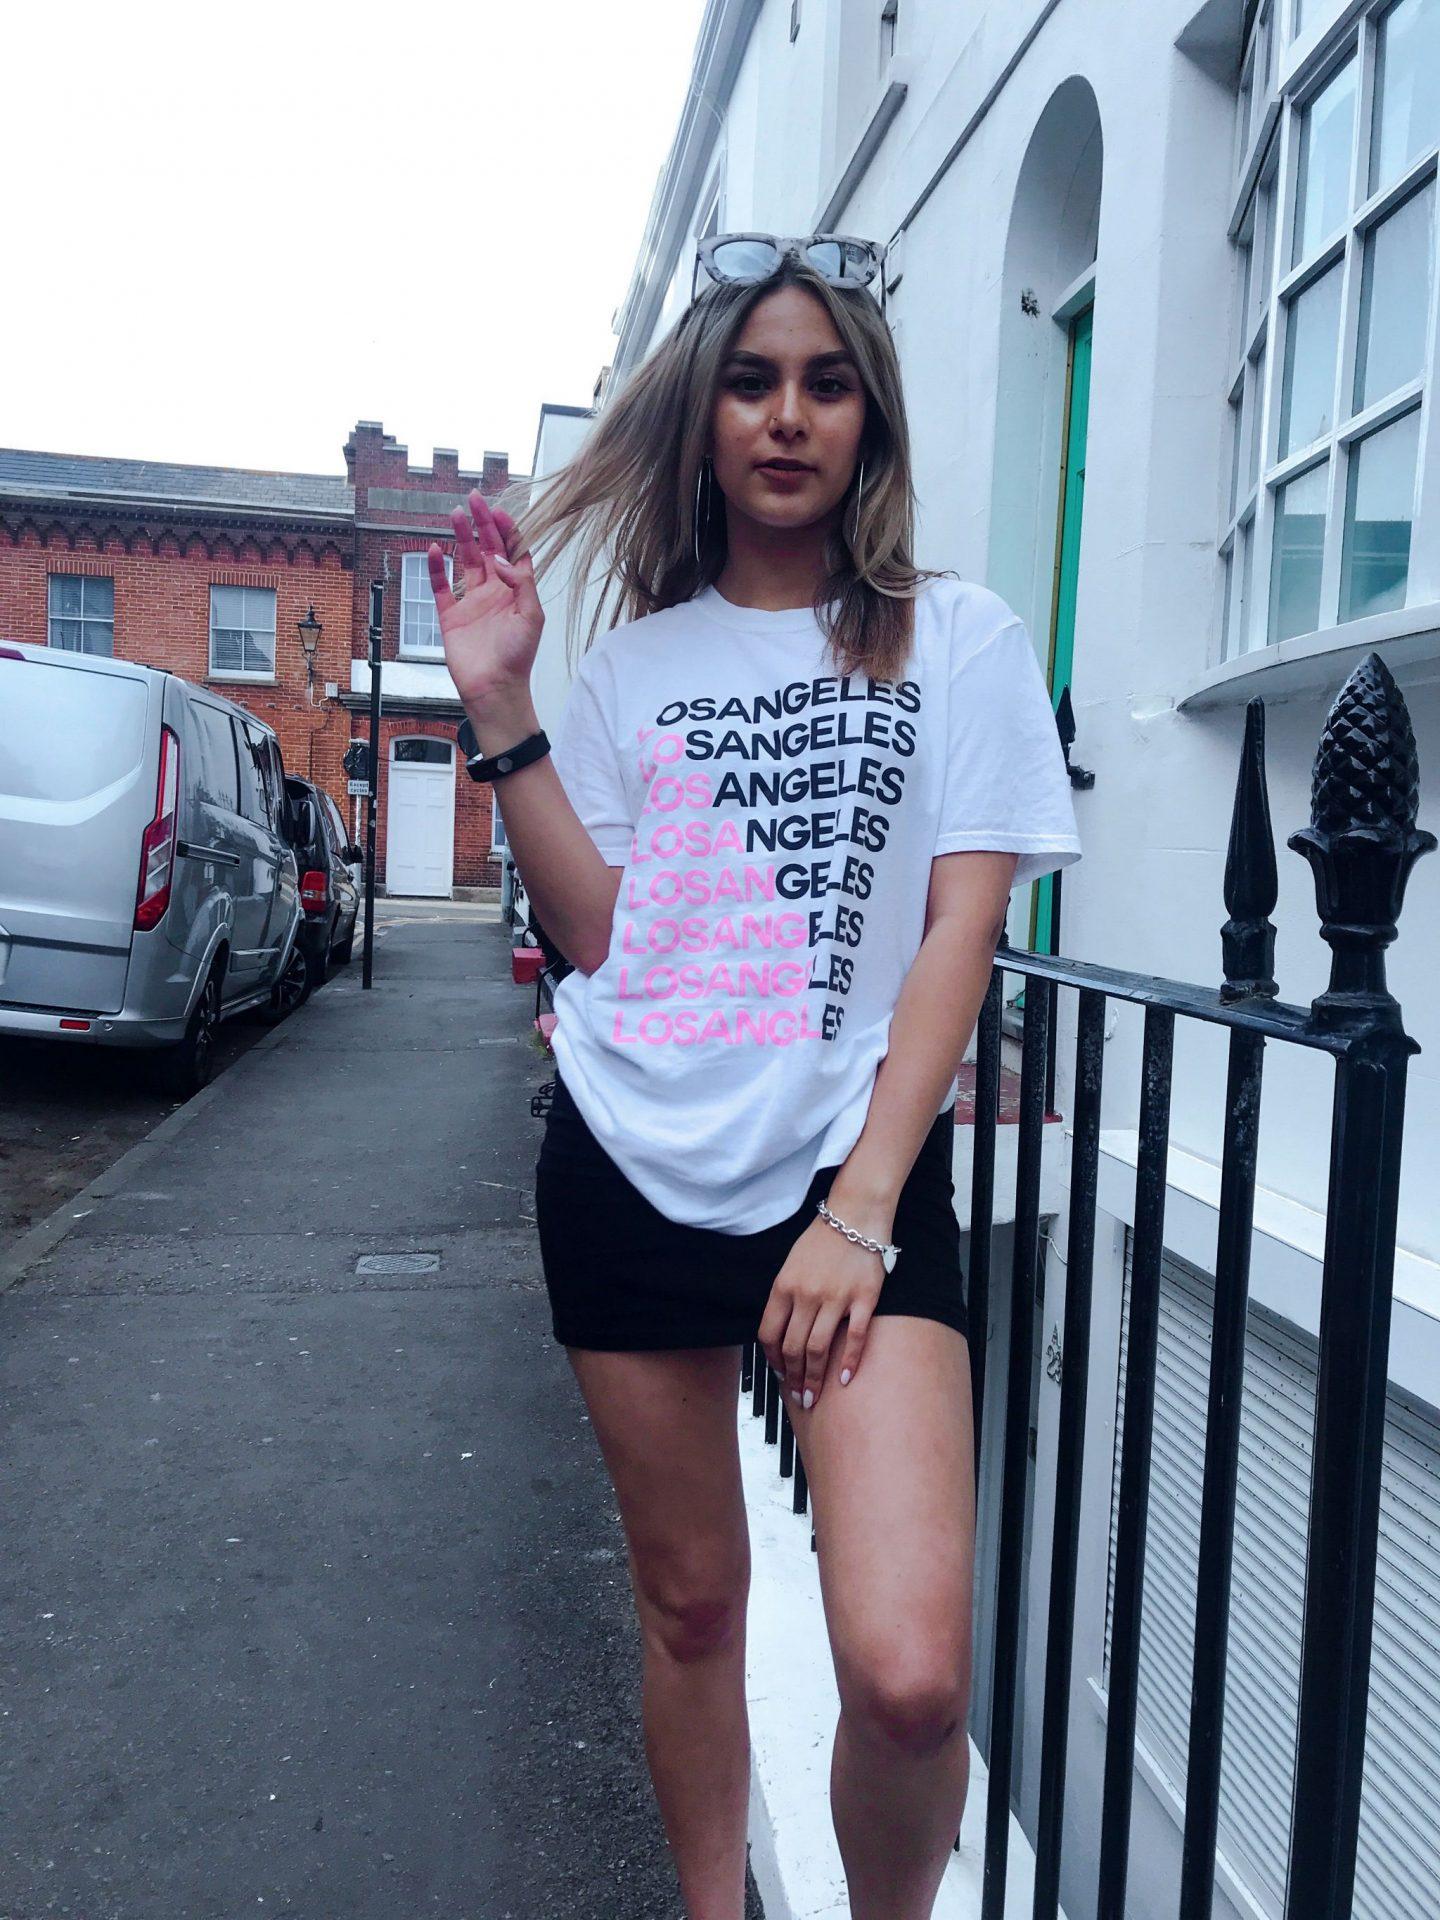 yasmin stefanie urban outfitters slogan tee tshirt los angeles